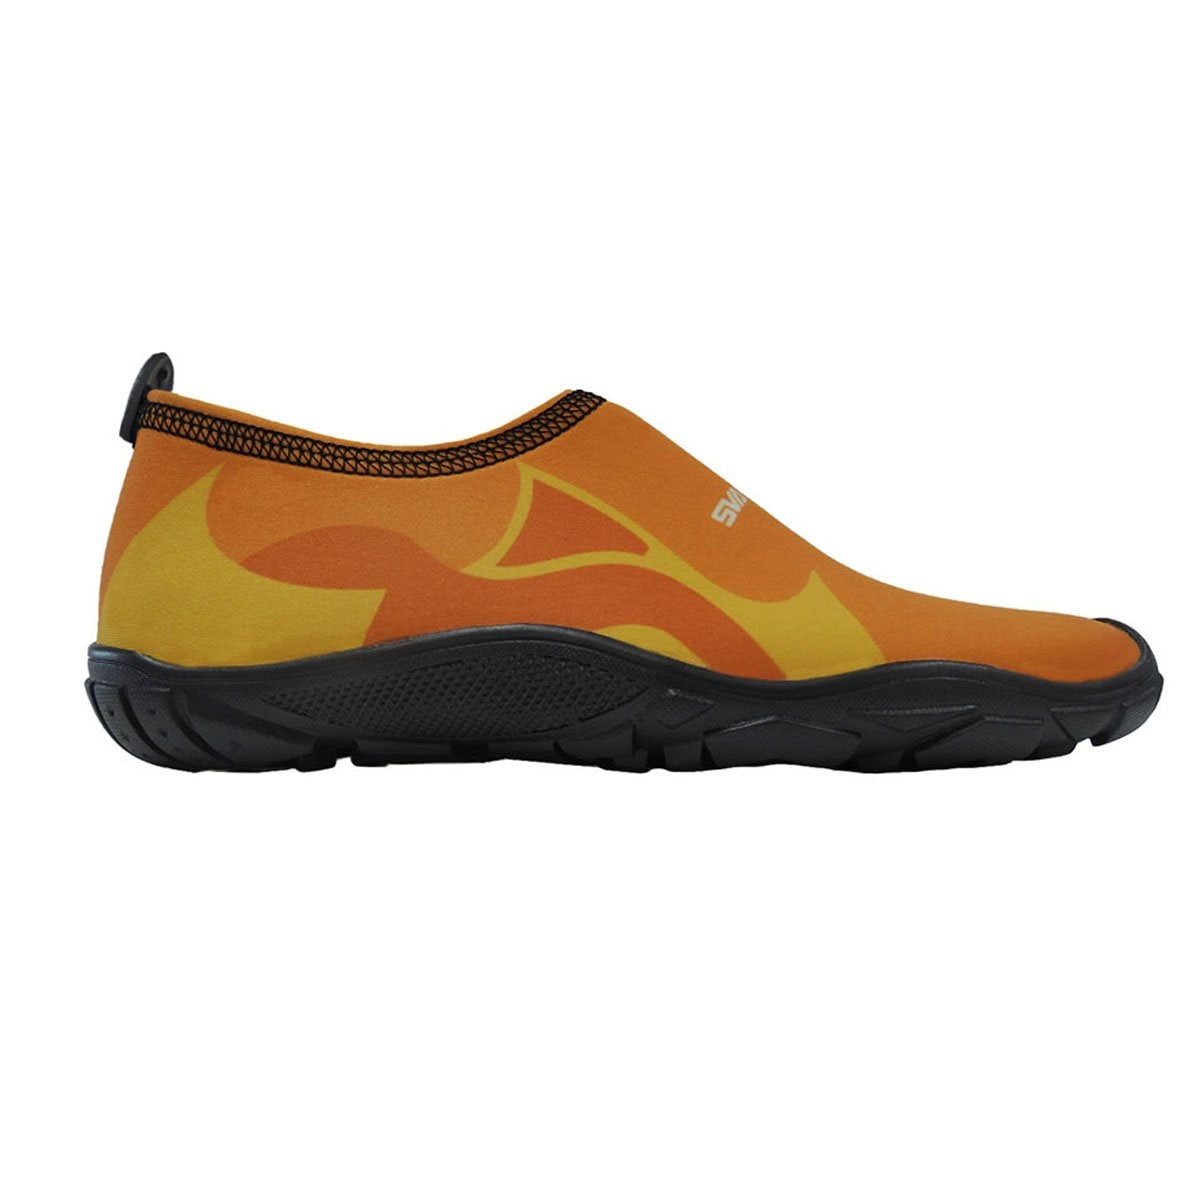 Zapato Acuático Tiburón Naranja Svago - Infantil